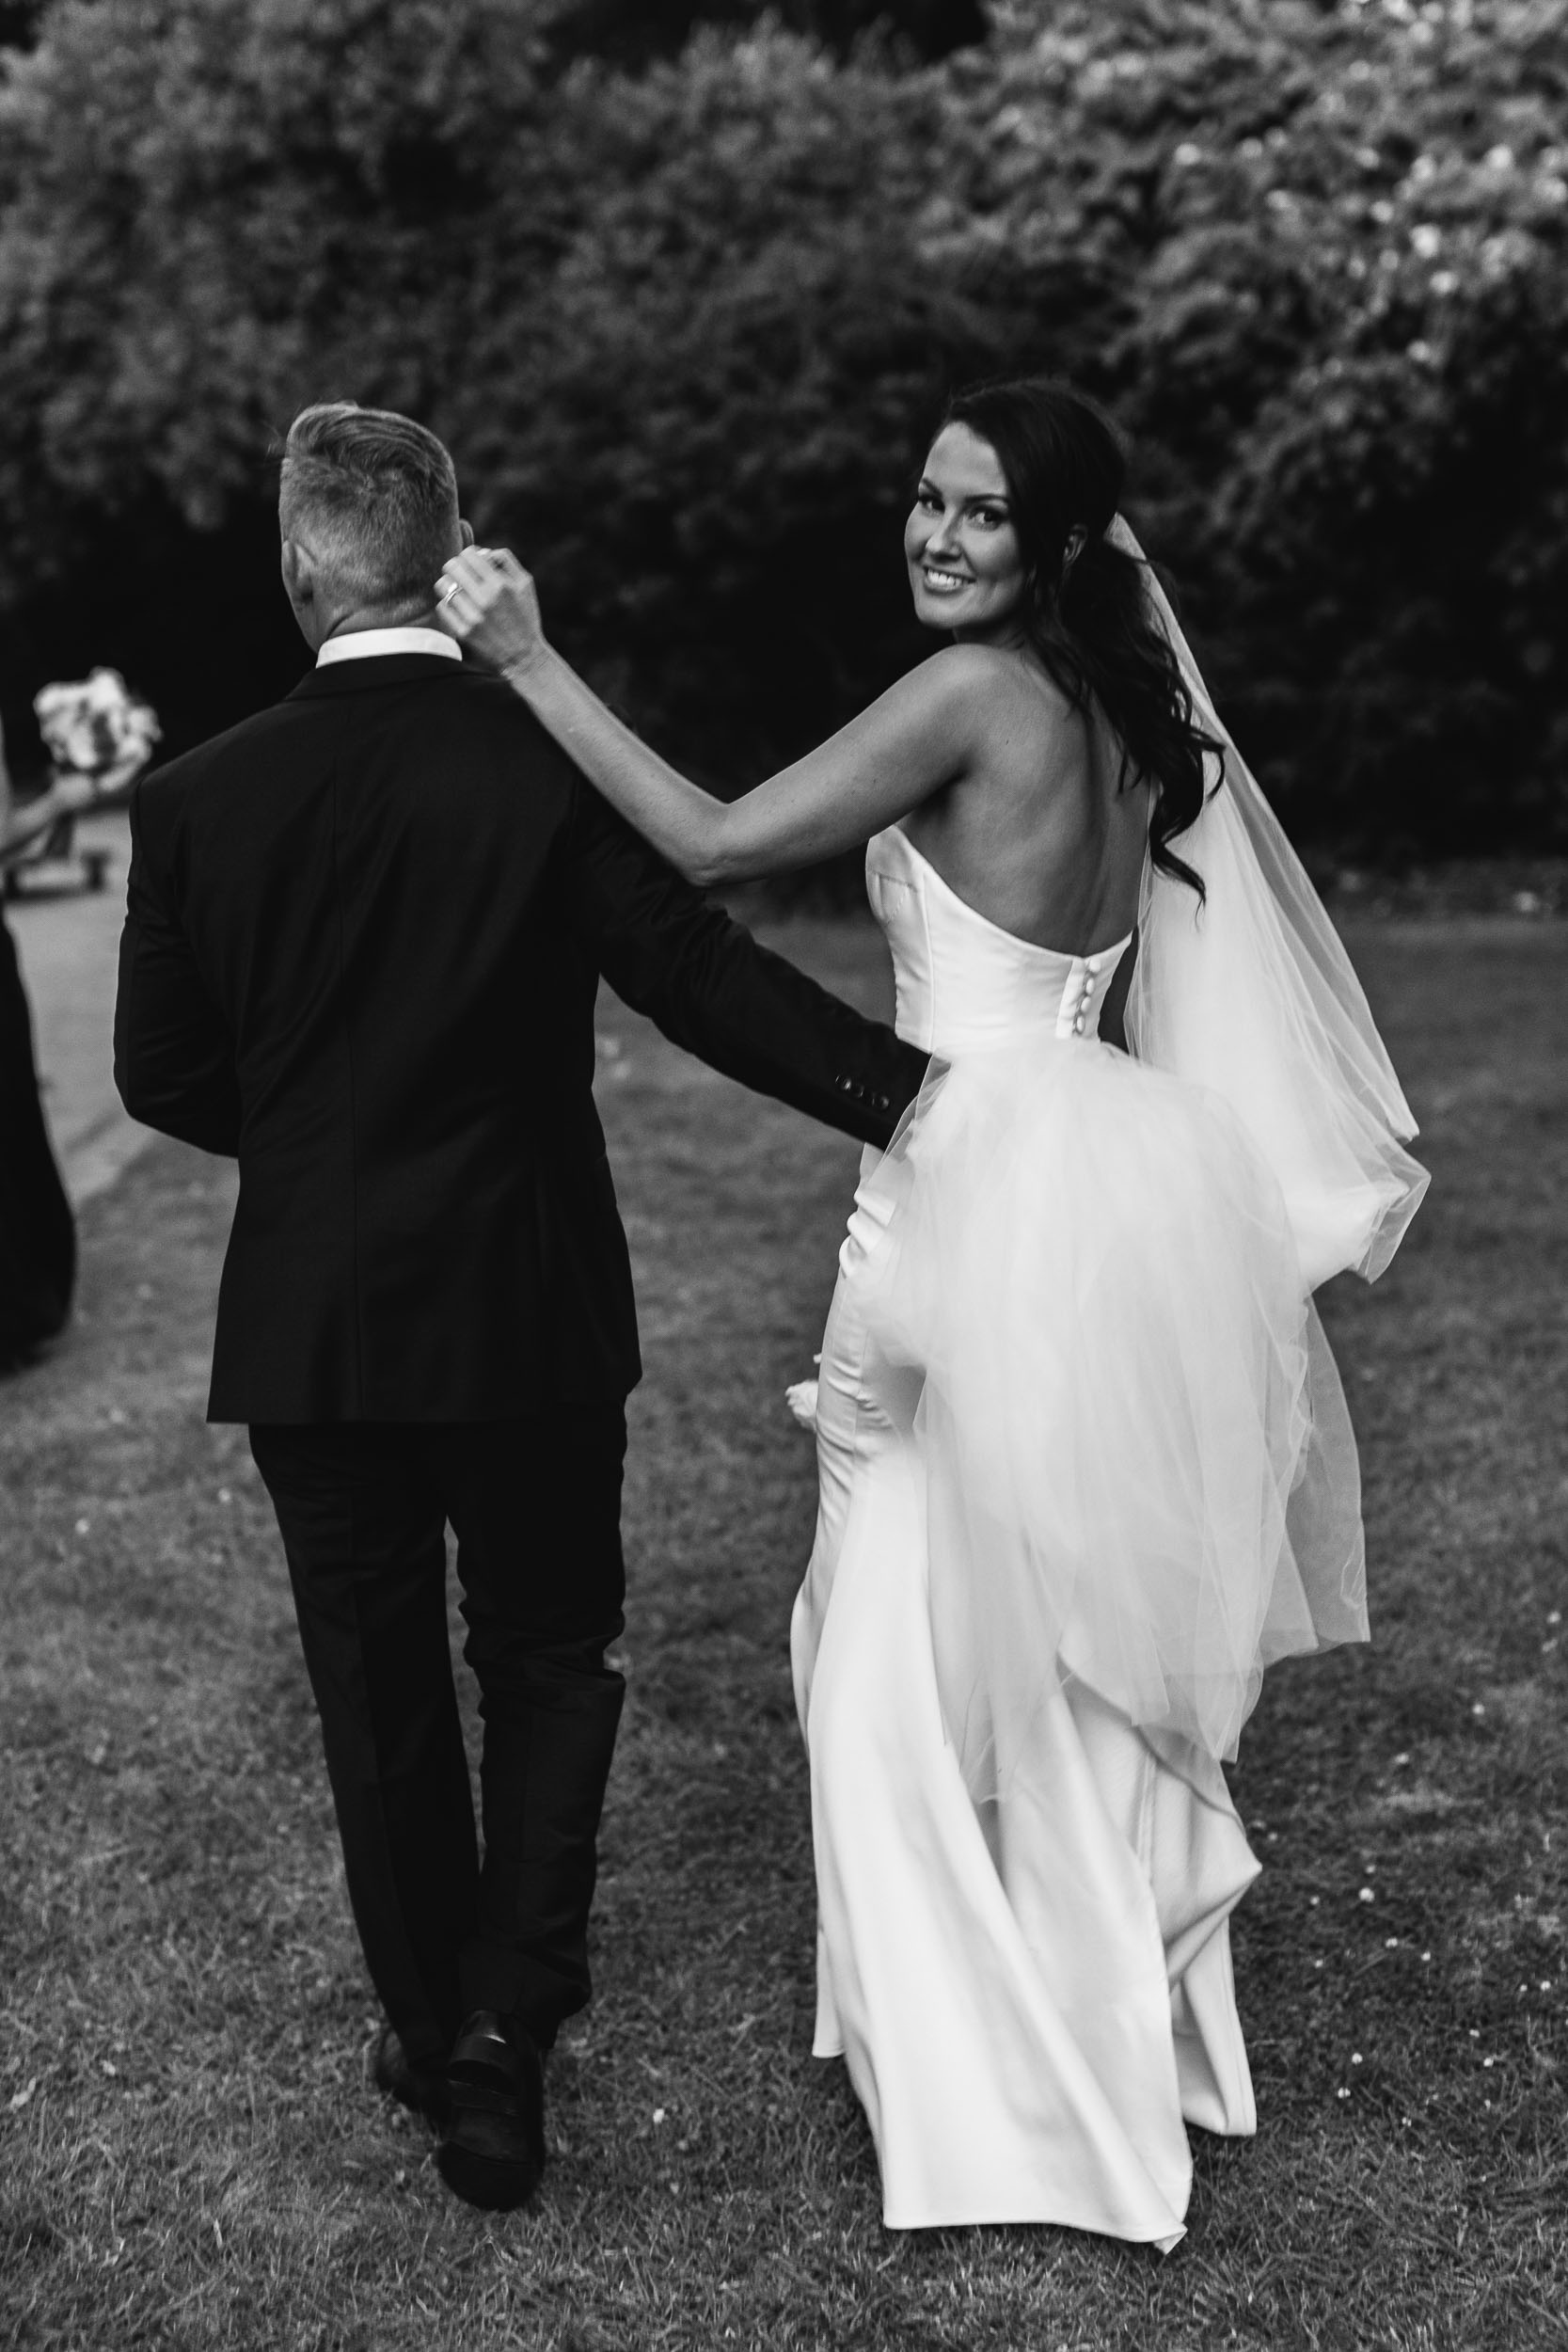 Kas-Richards-Melbourne-Garden-Wedding-Aerial-South-Whark-Georgia-Young-Couture-337.jpg